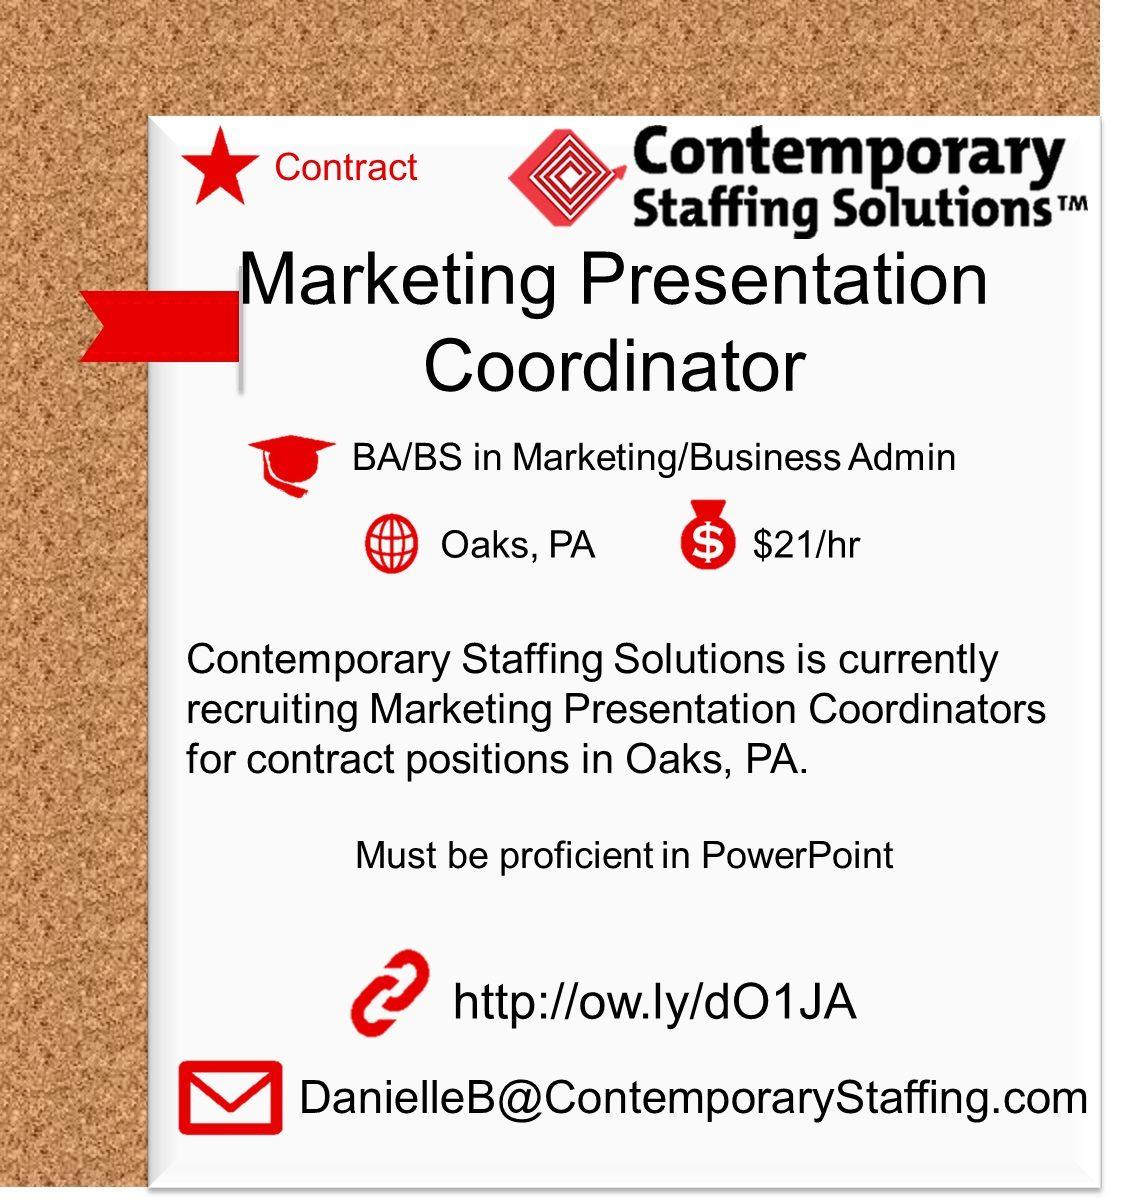 CSS is hiring Marketing Presentation Coordinators 21